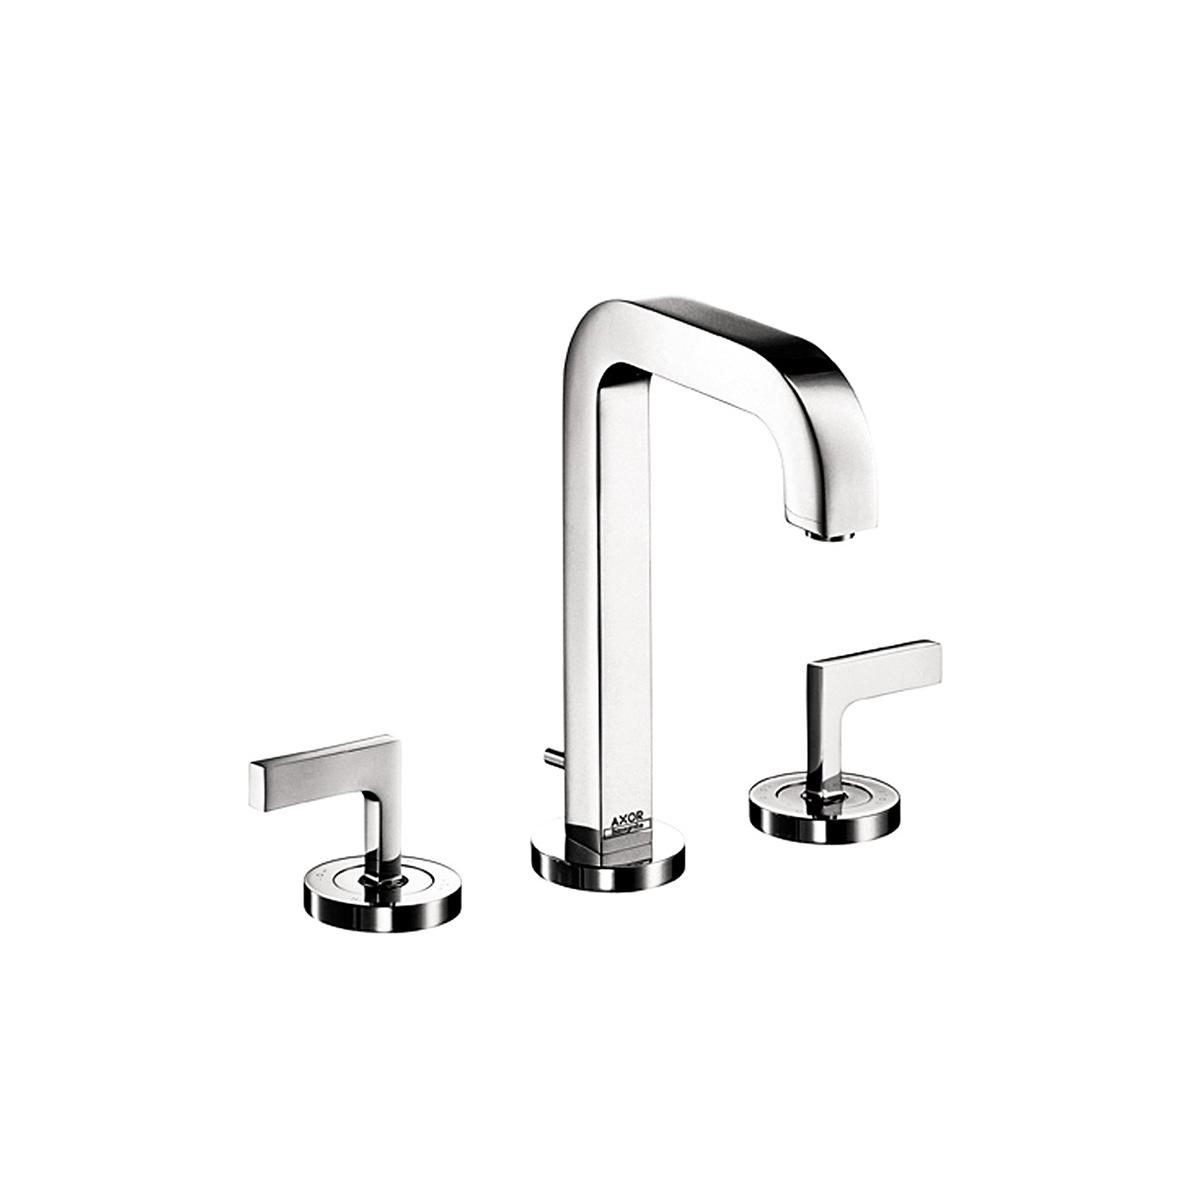 Bath4All - Hansgrohe 39135001 Chrome Axor Citterio Bathroom Faucet ...